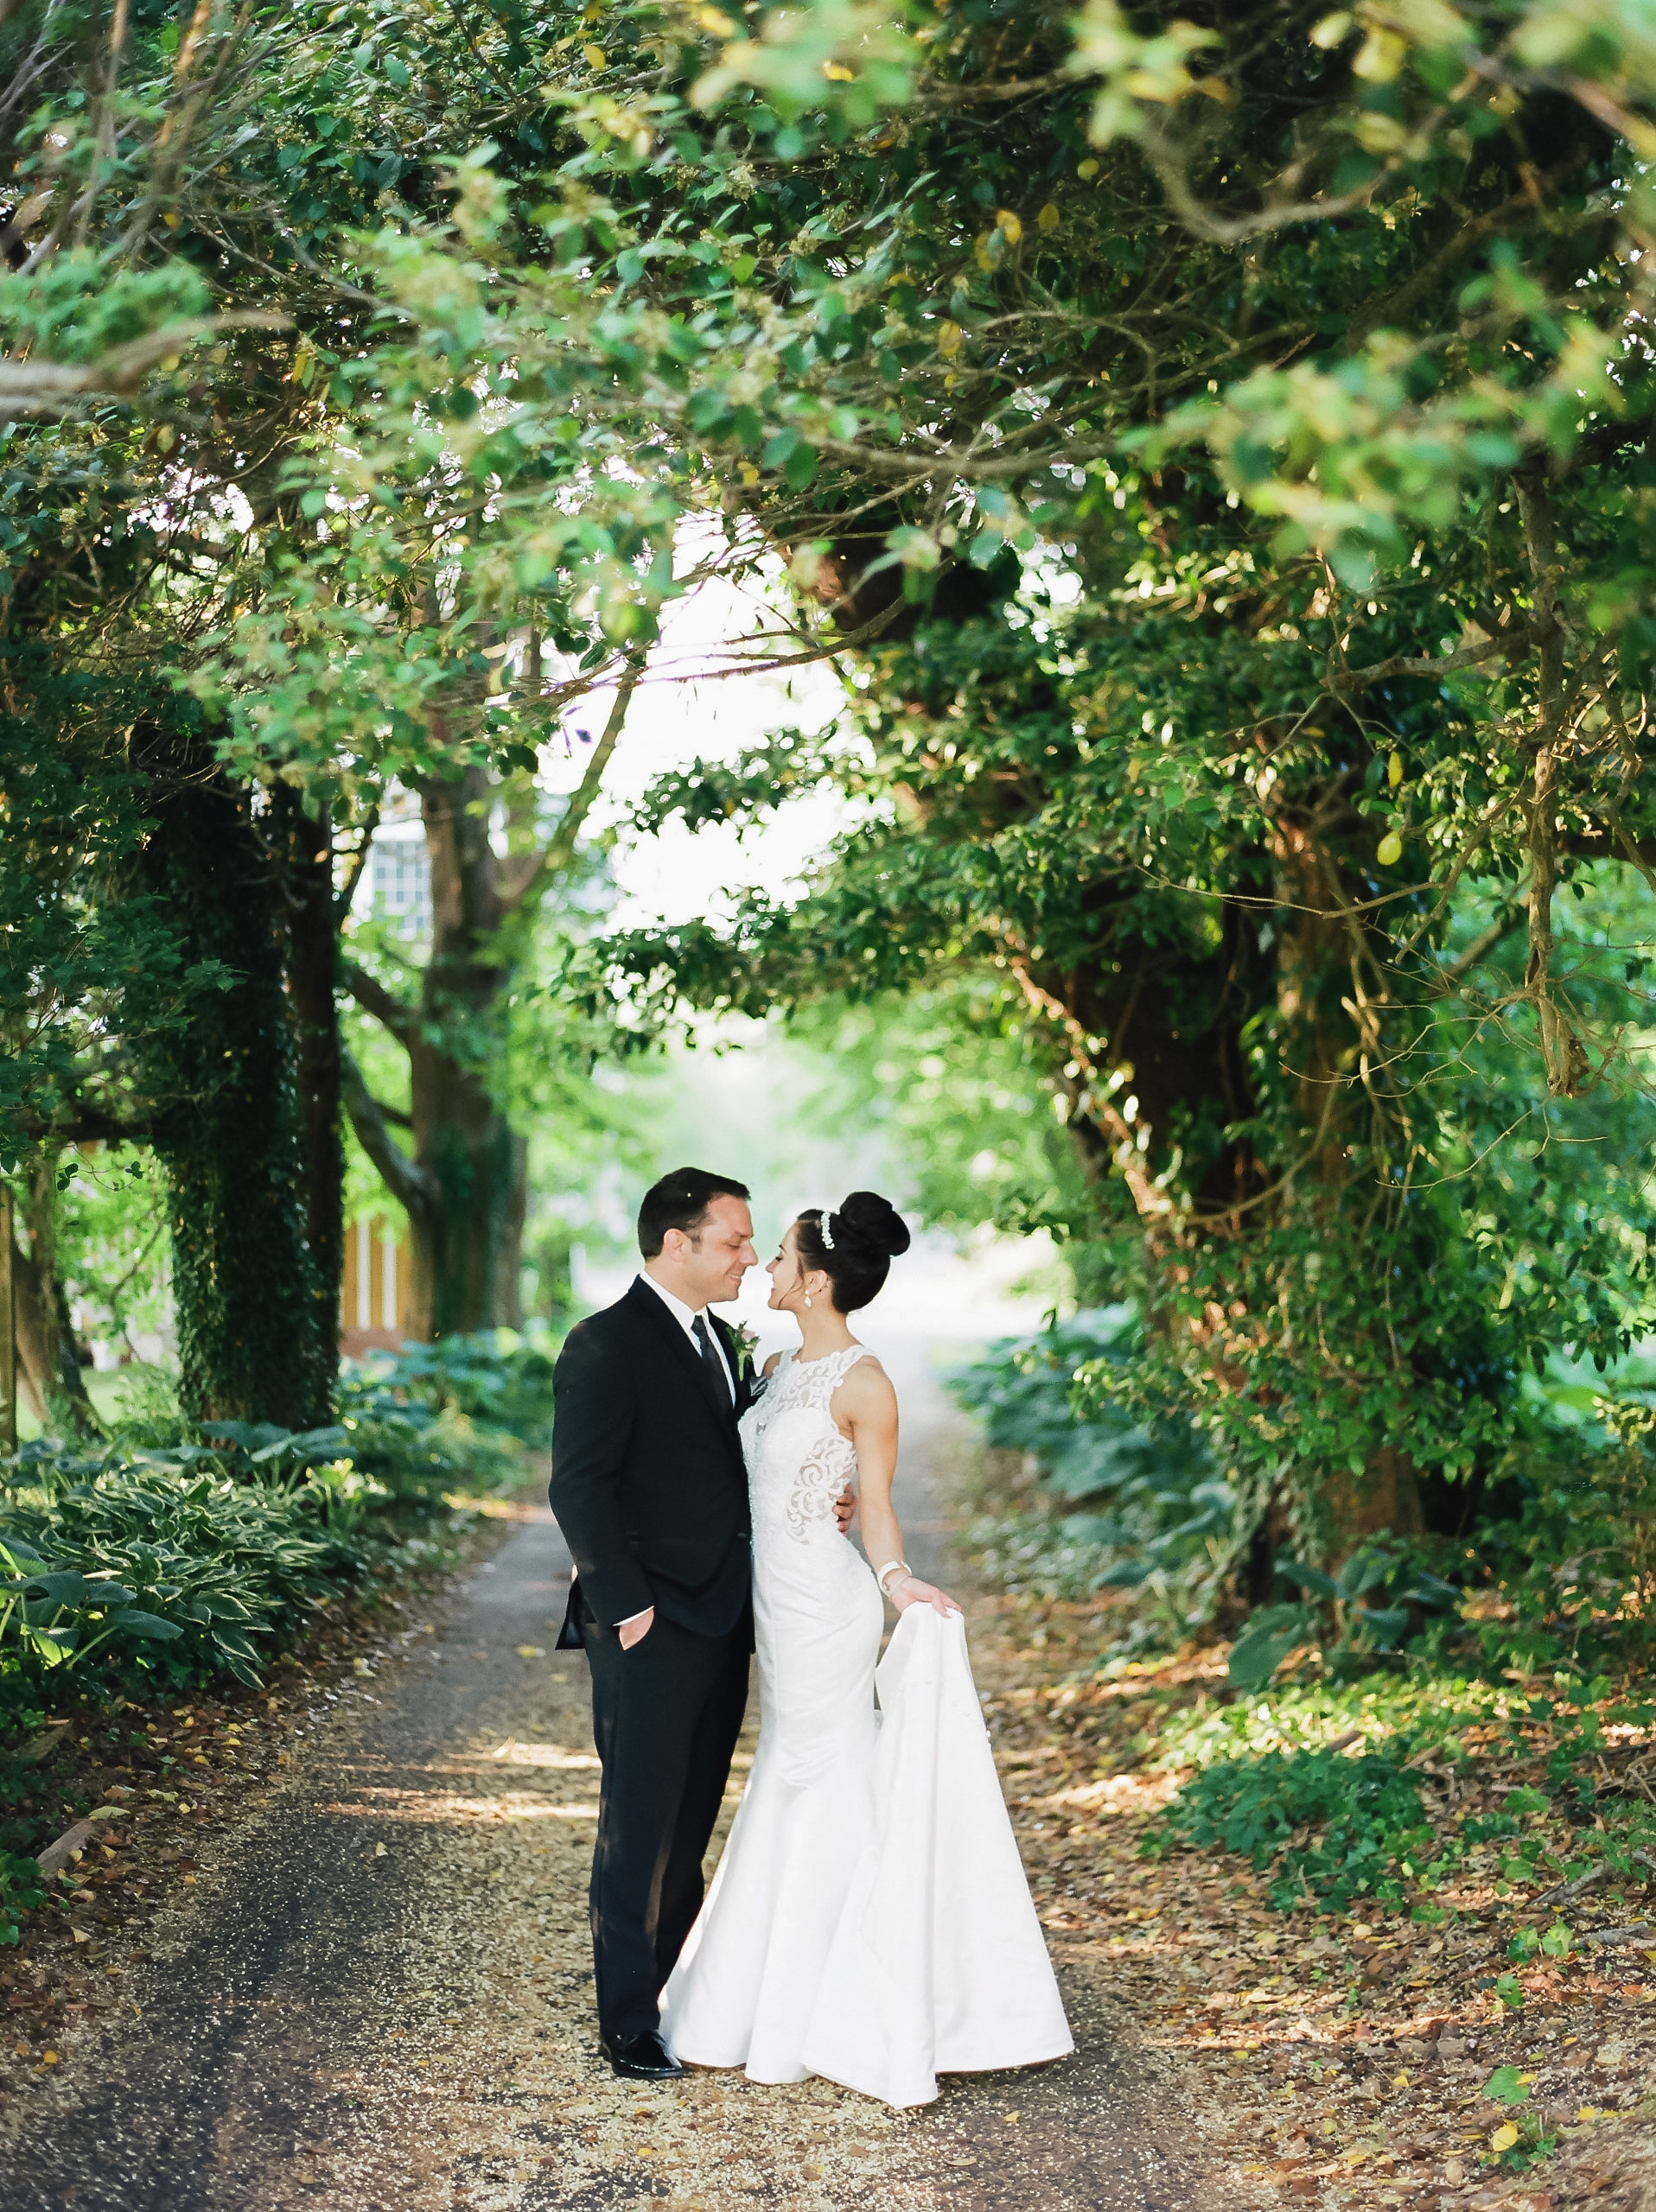 MagdalenaStudios_WeddingPhotographer_WillowCreekWinery_CarissaJoe-432.jpg